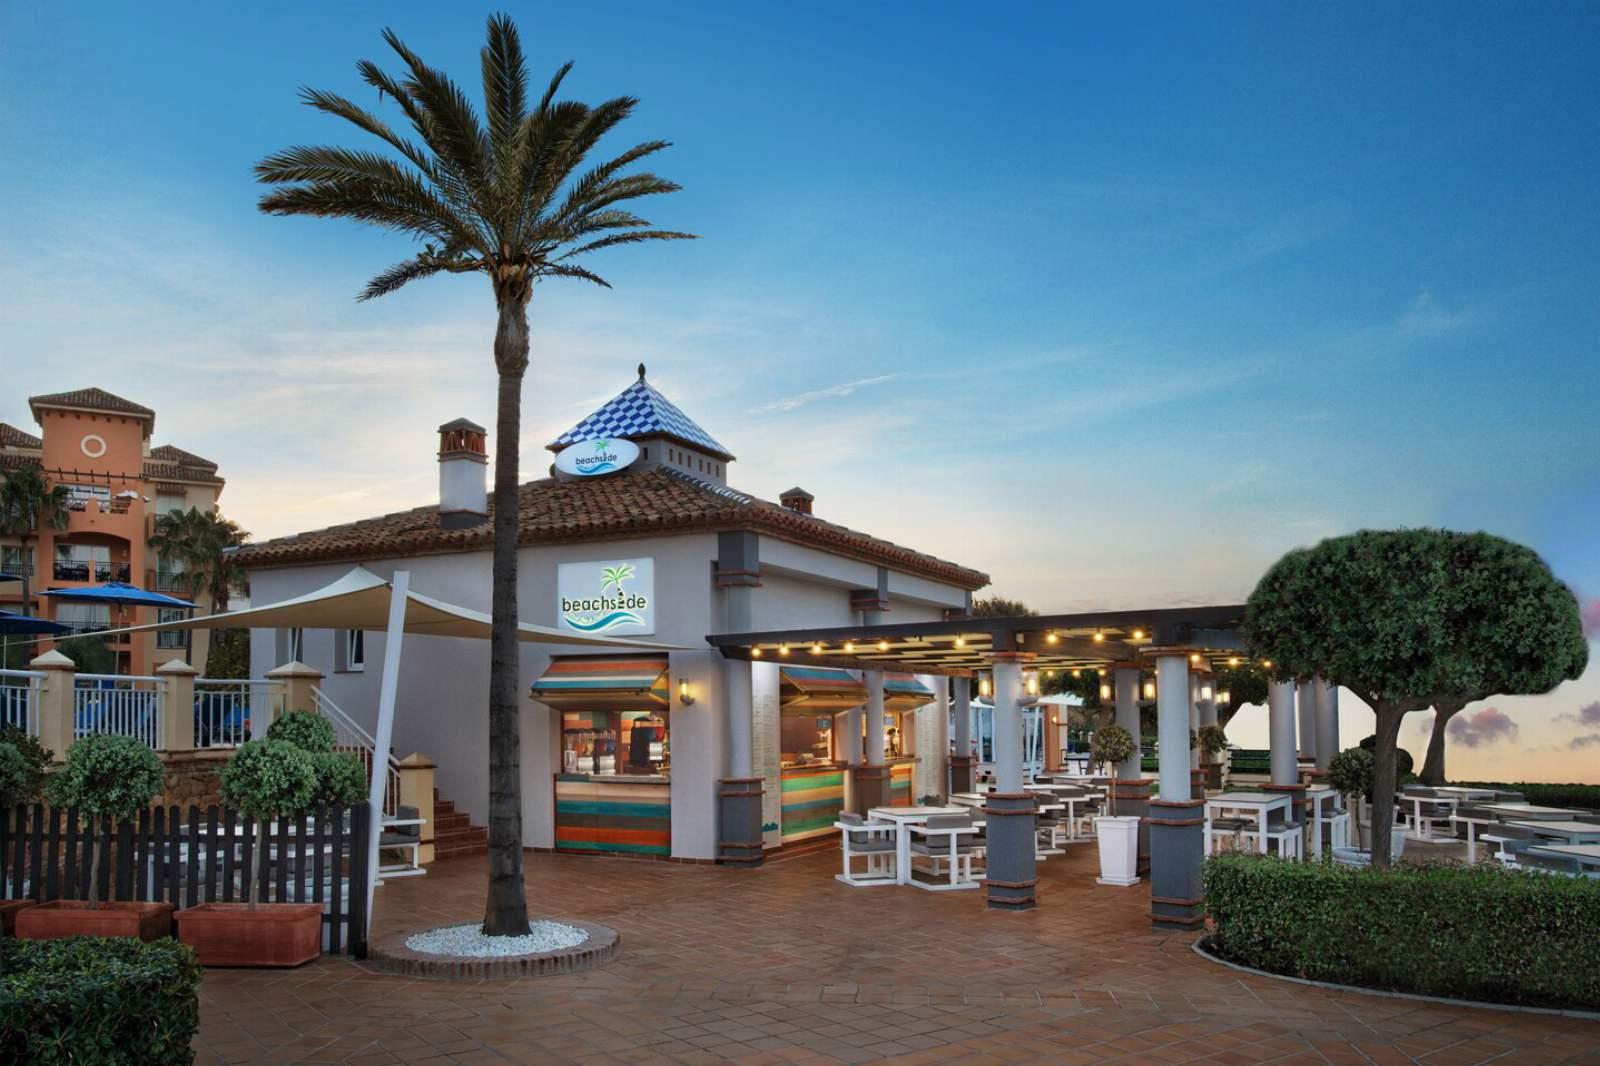 Marriott's Marbella Beach Resort - Beachside Bar & Grille